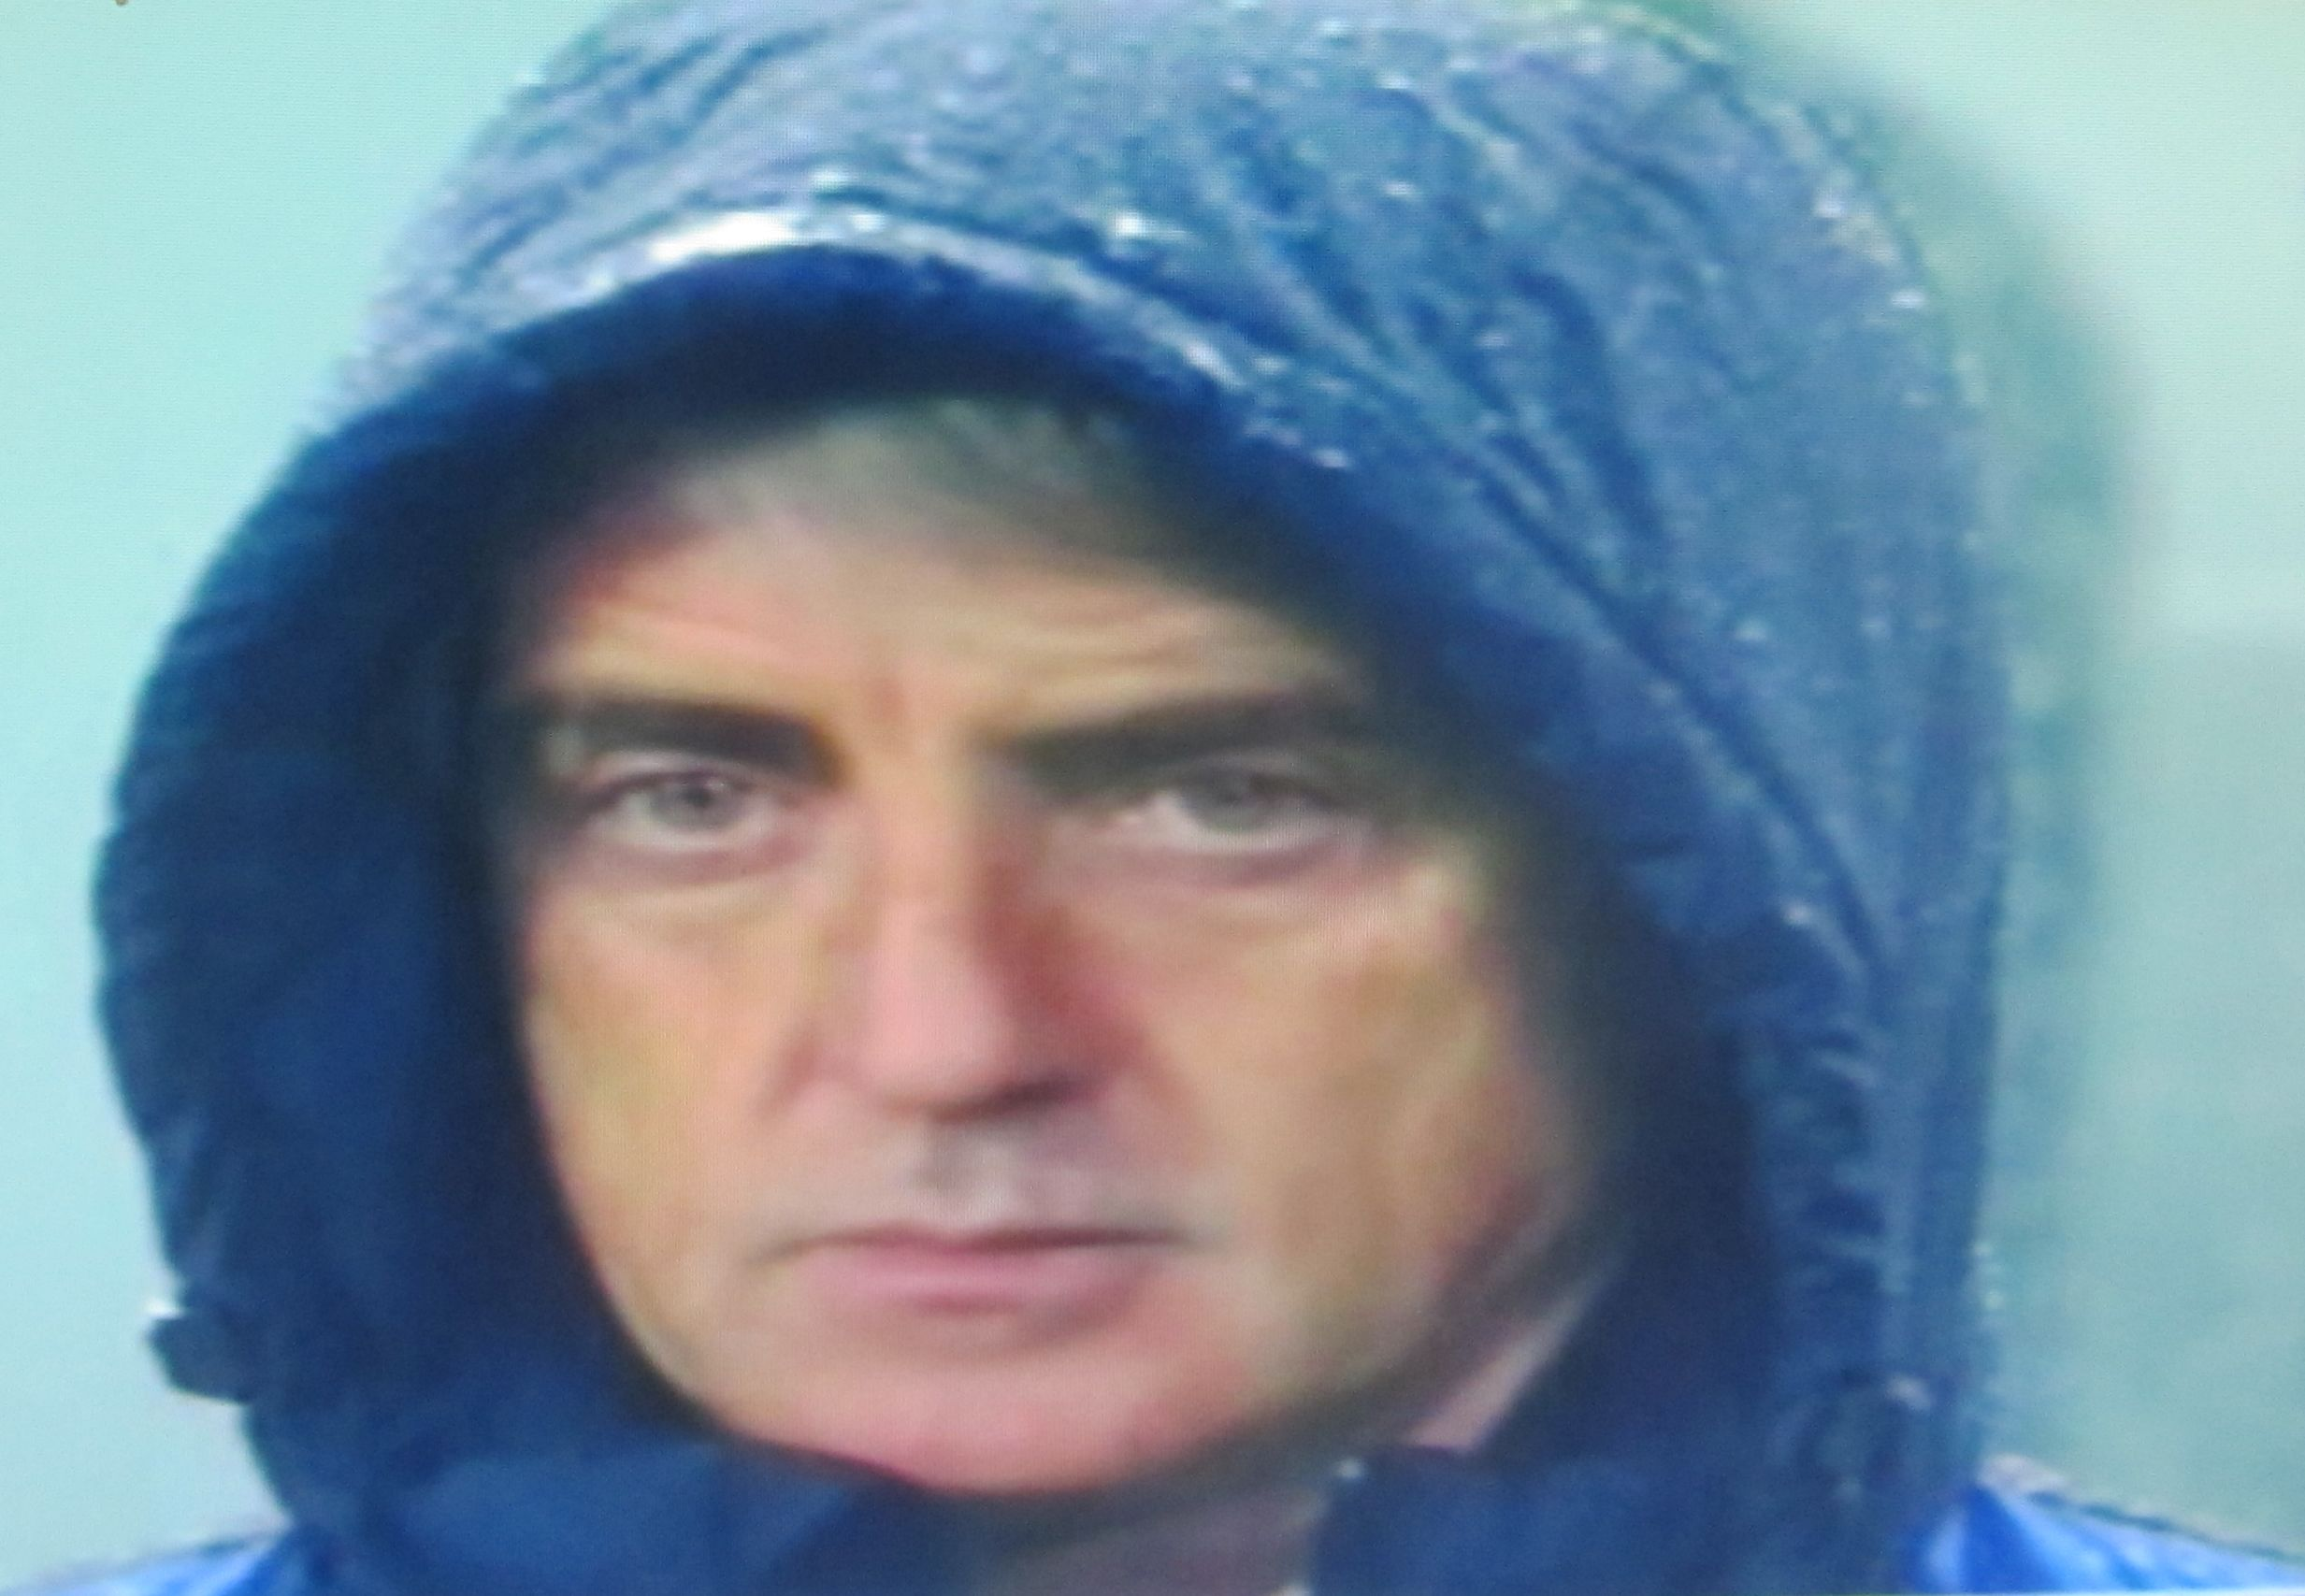 Mancio desolato Juve-Inter